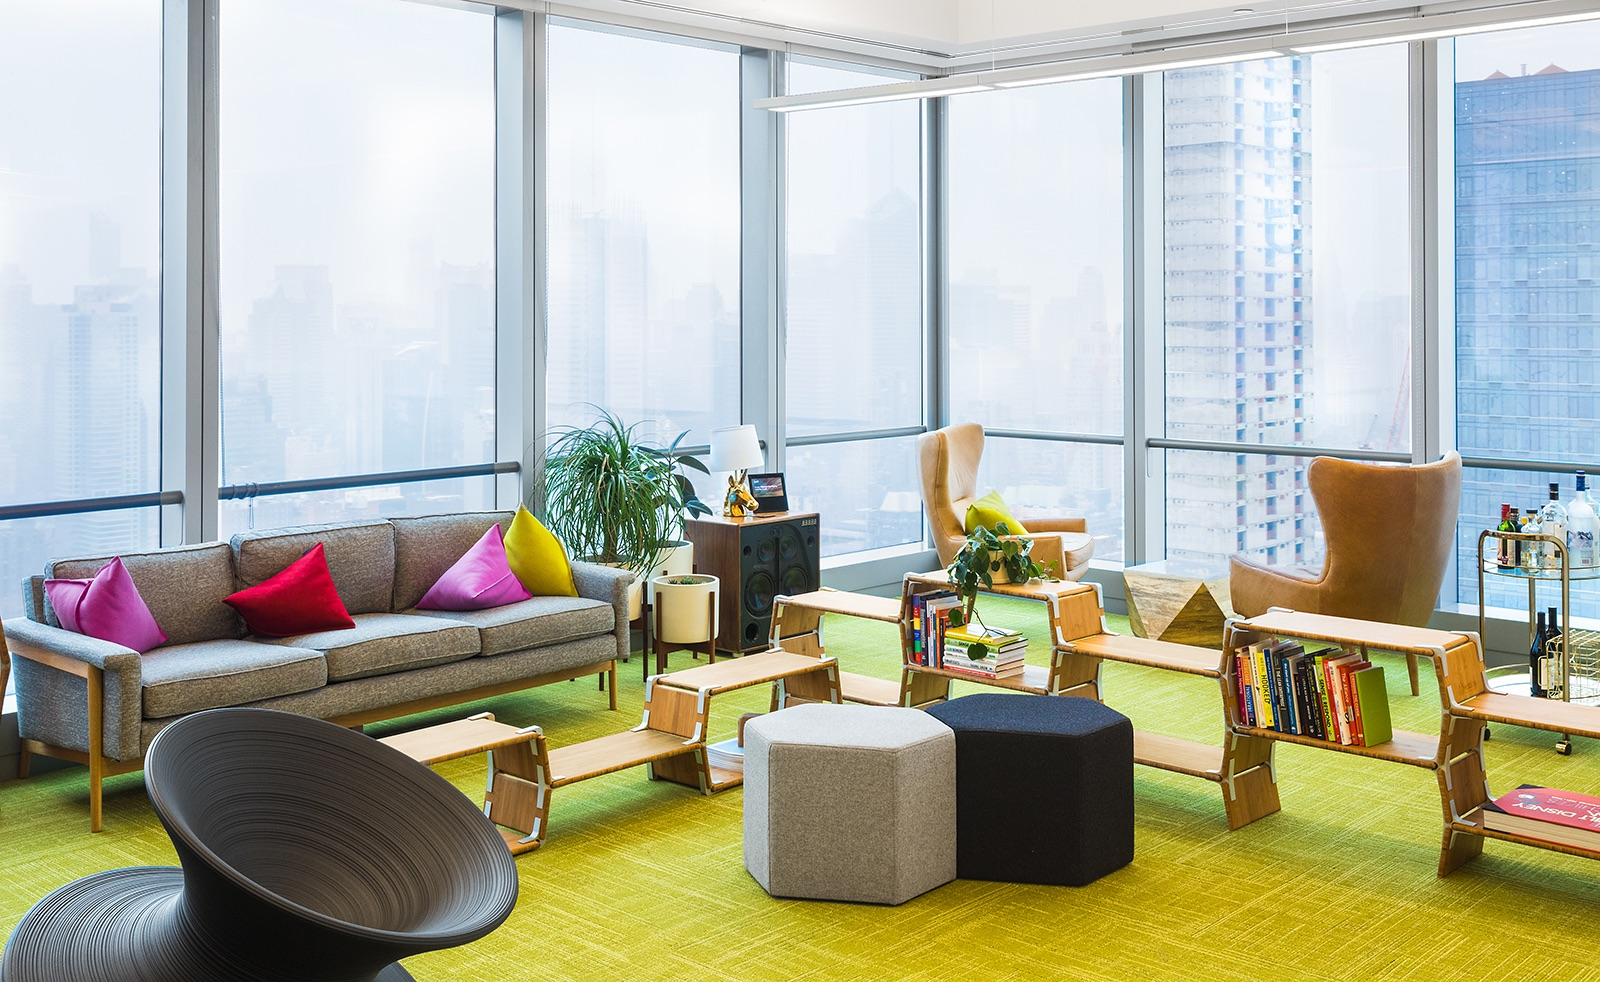 bcg-digital-ventures-office-8